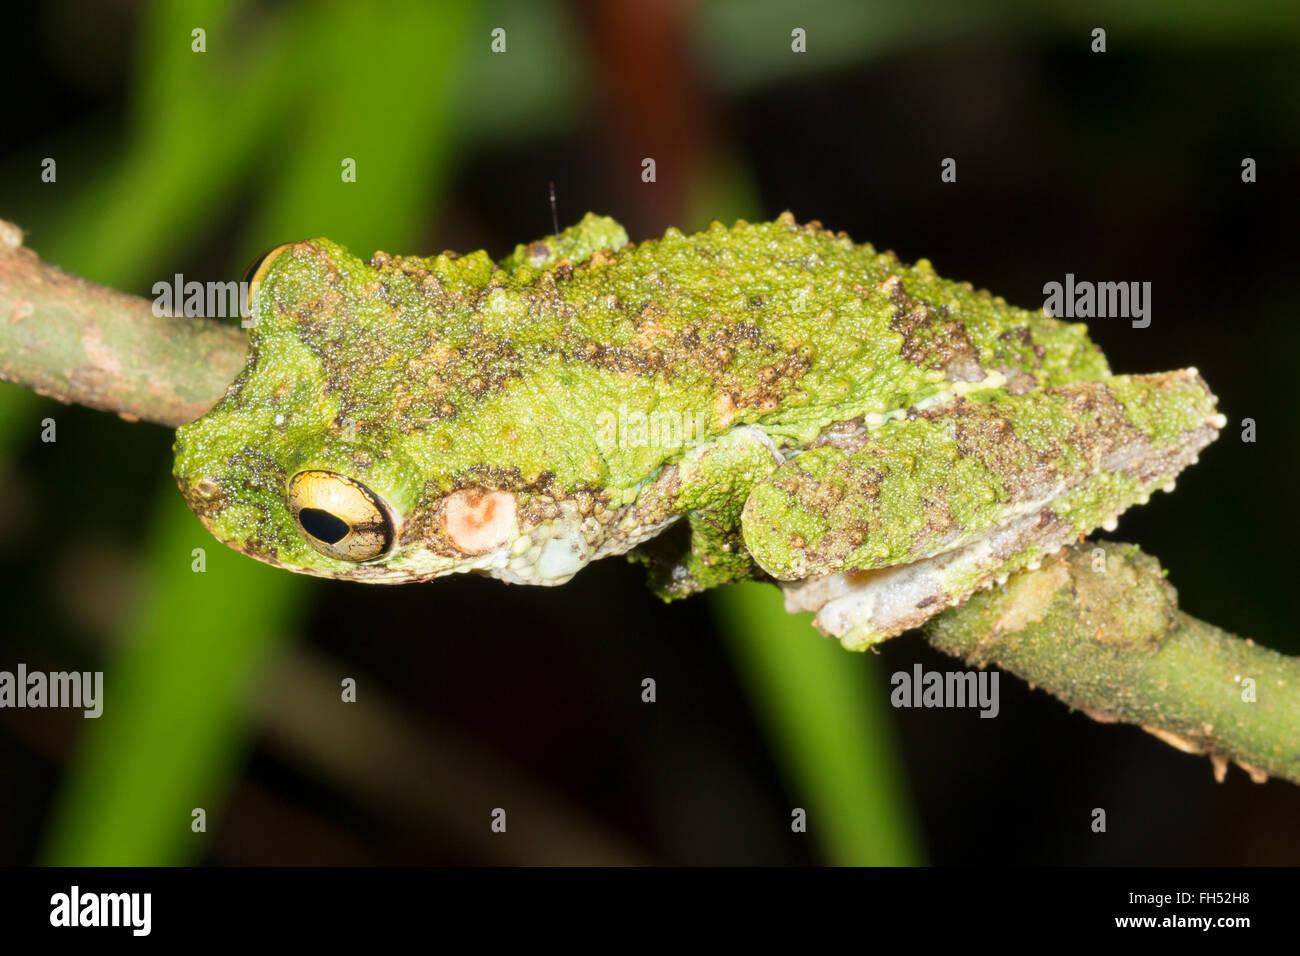 Buckley's Slender Legged Treefrog (Osteocephalus buckleyi). On a branch In the rainforest, Pastaza province, - Stock Image